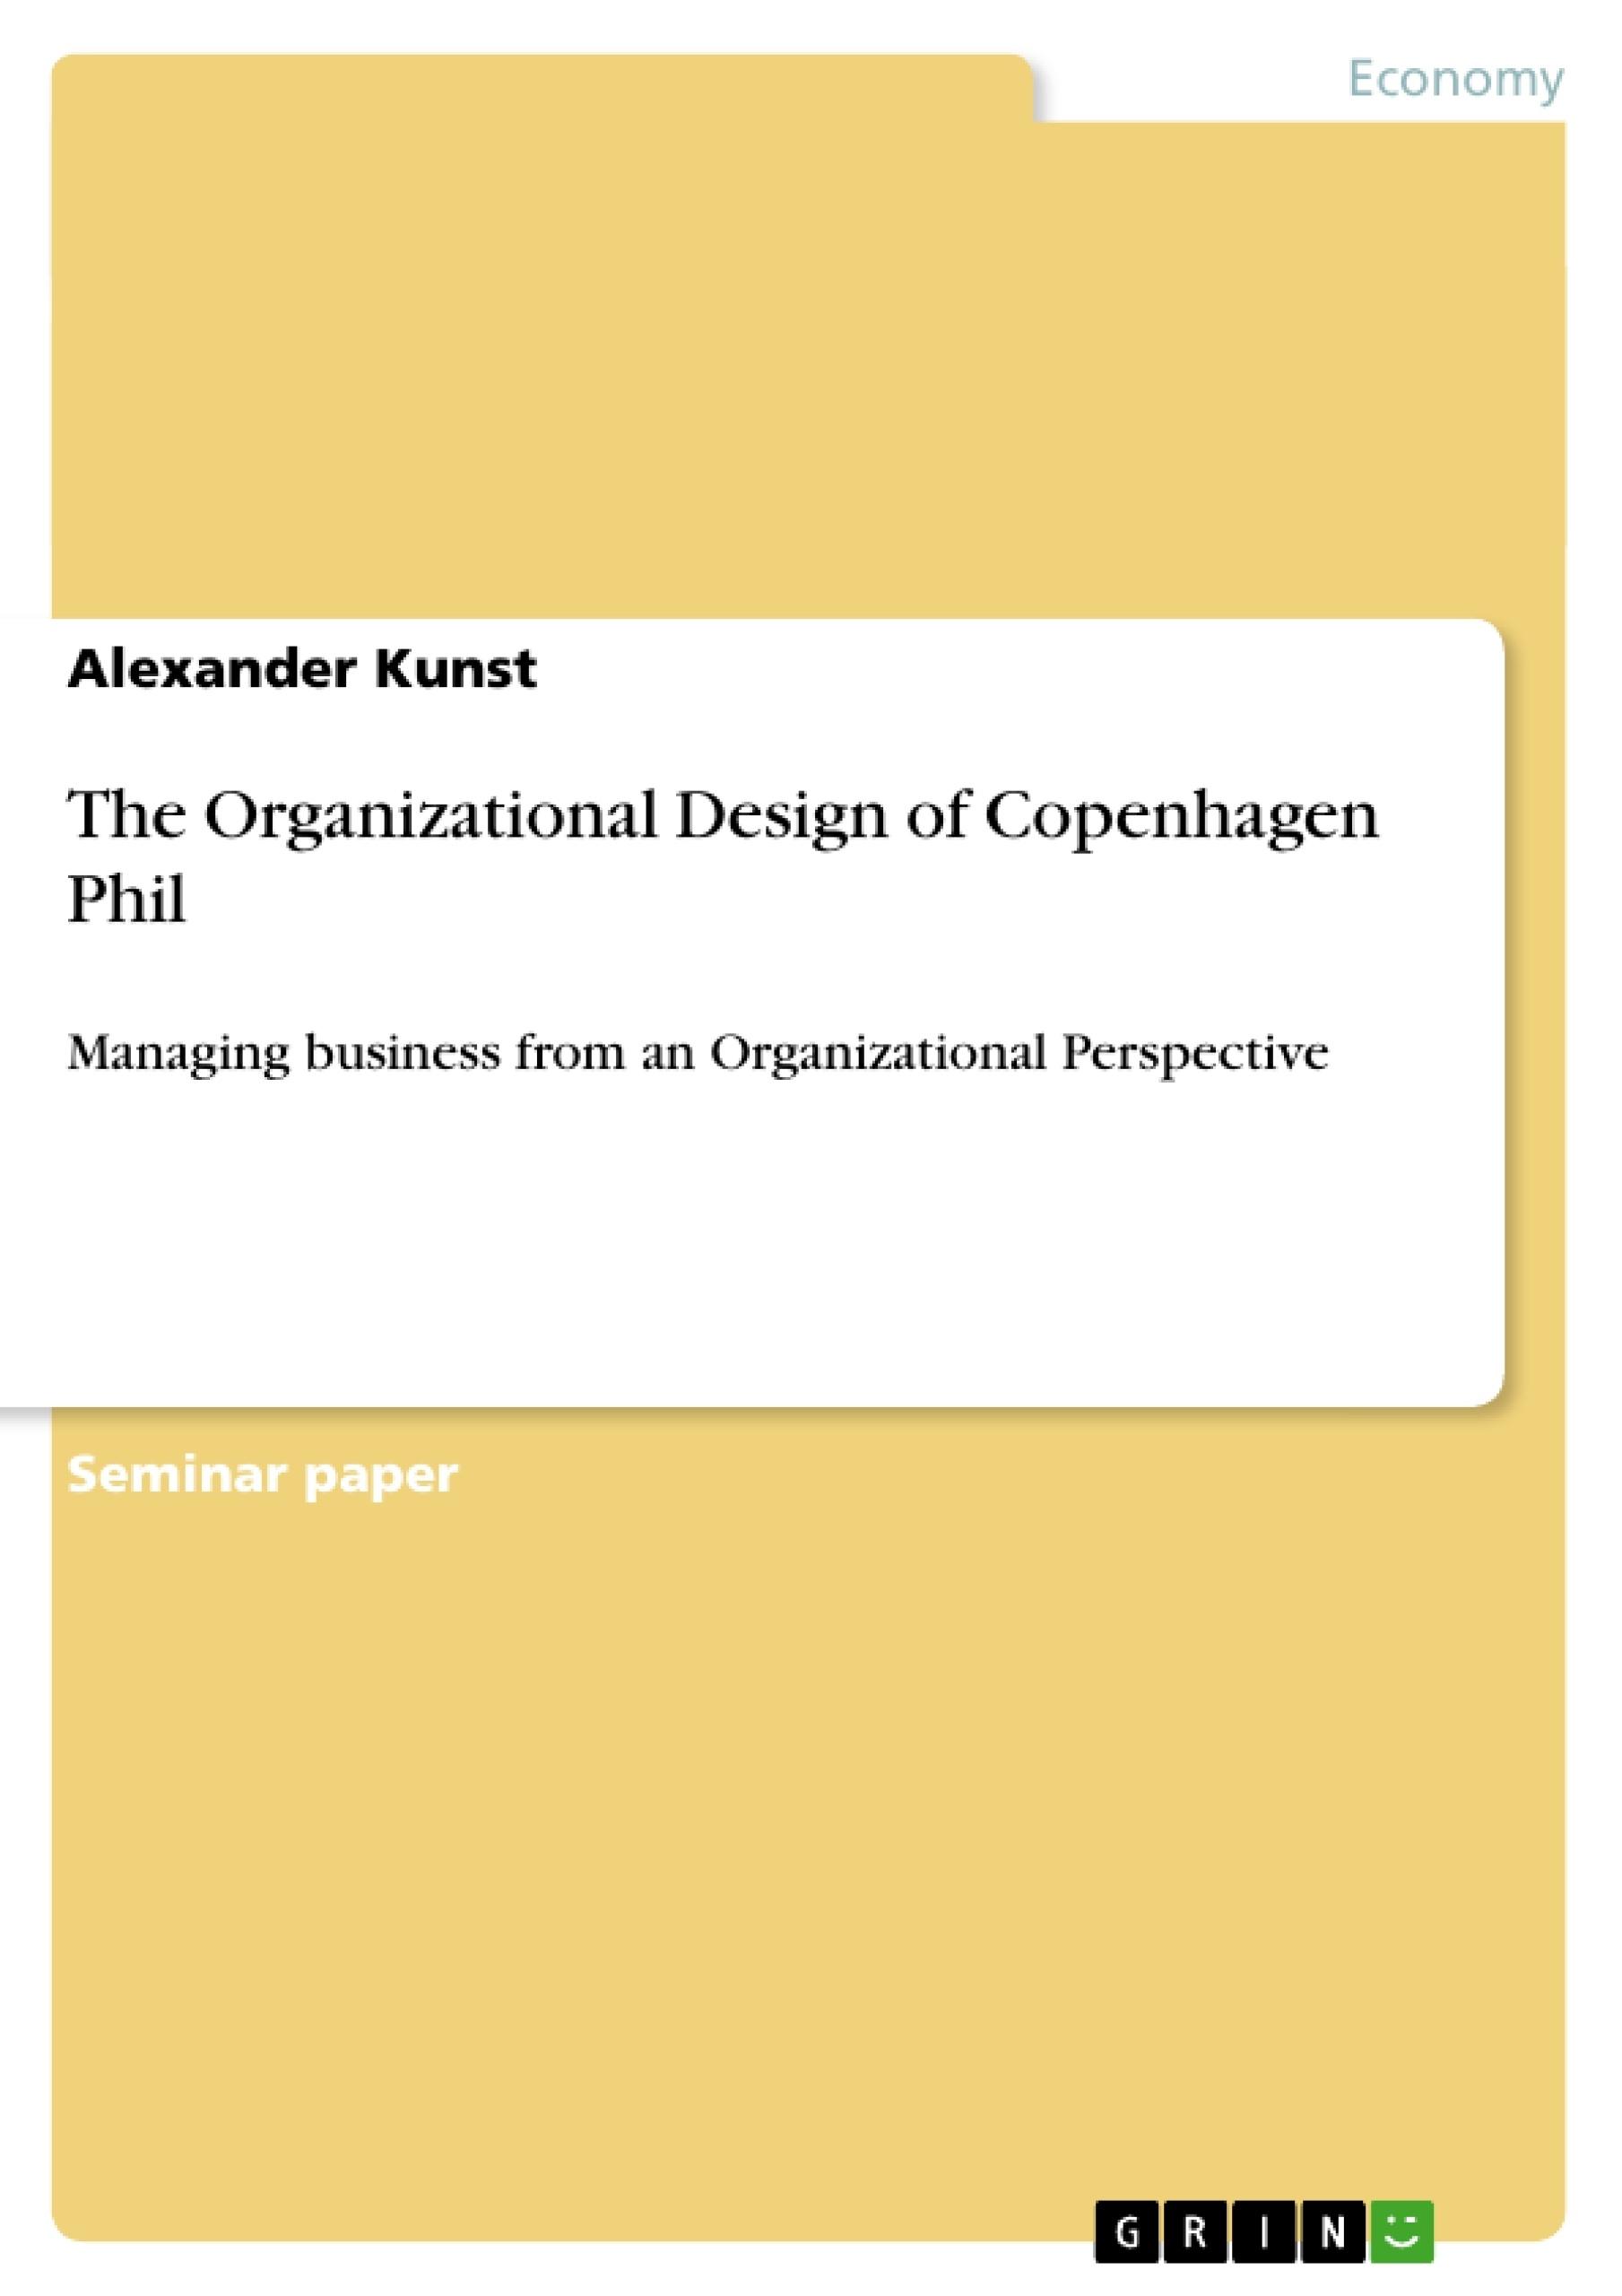 Title: The Organizational Design of Copenhagen Phil